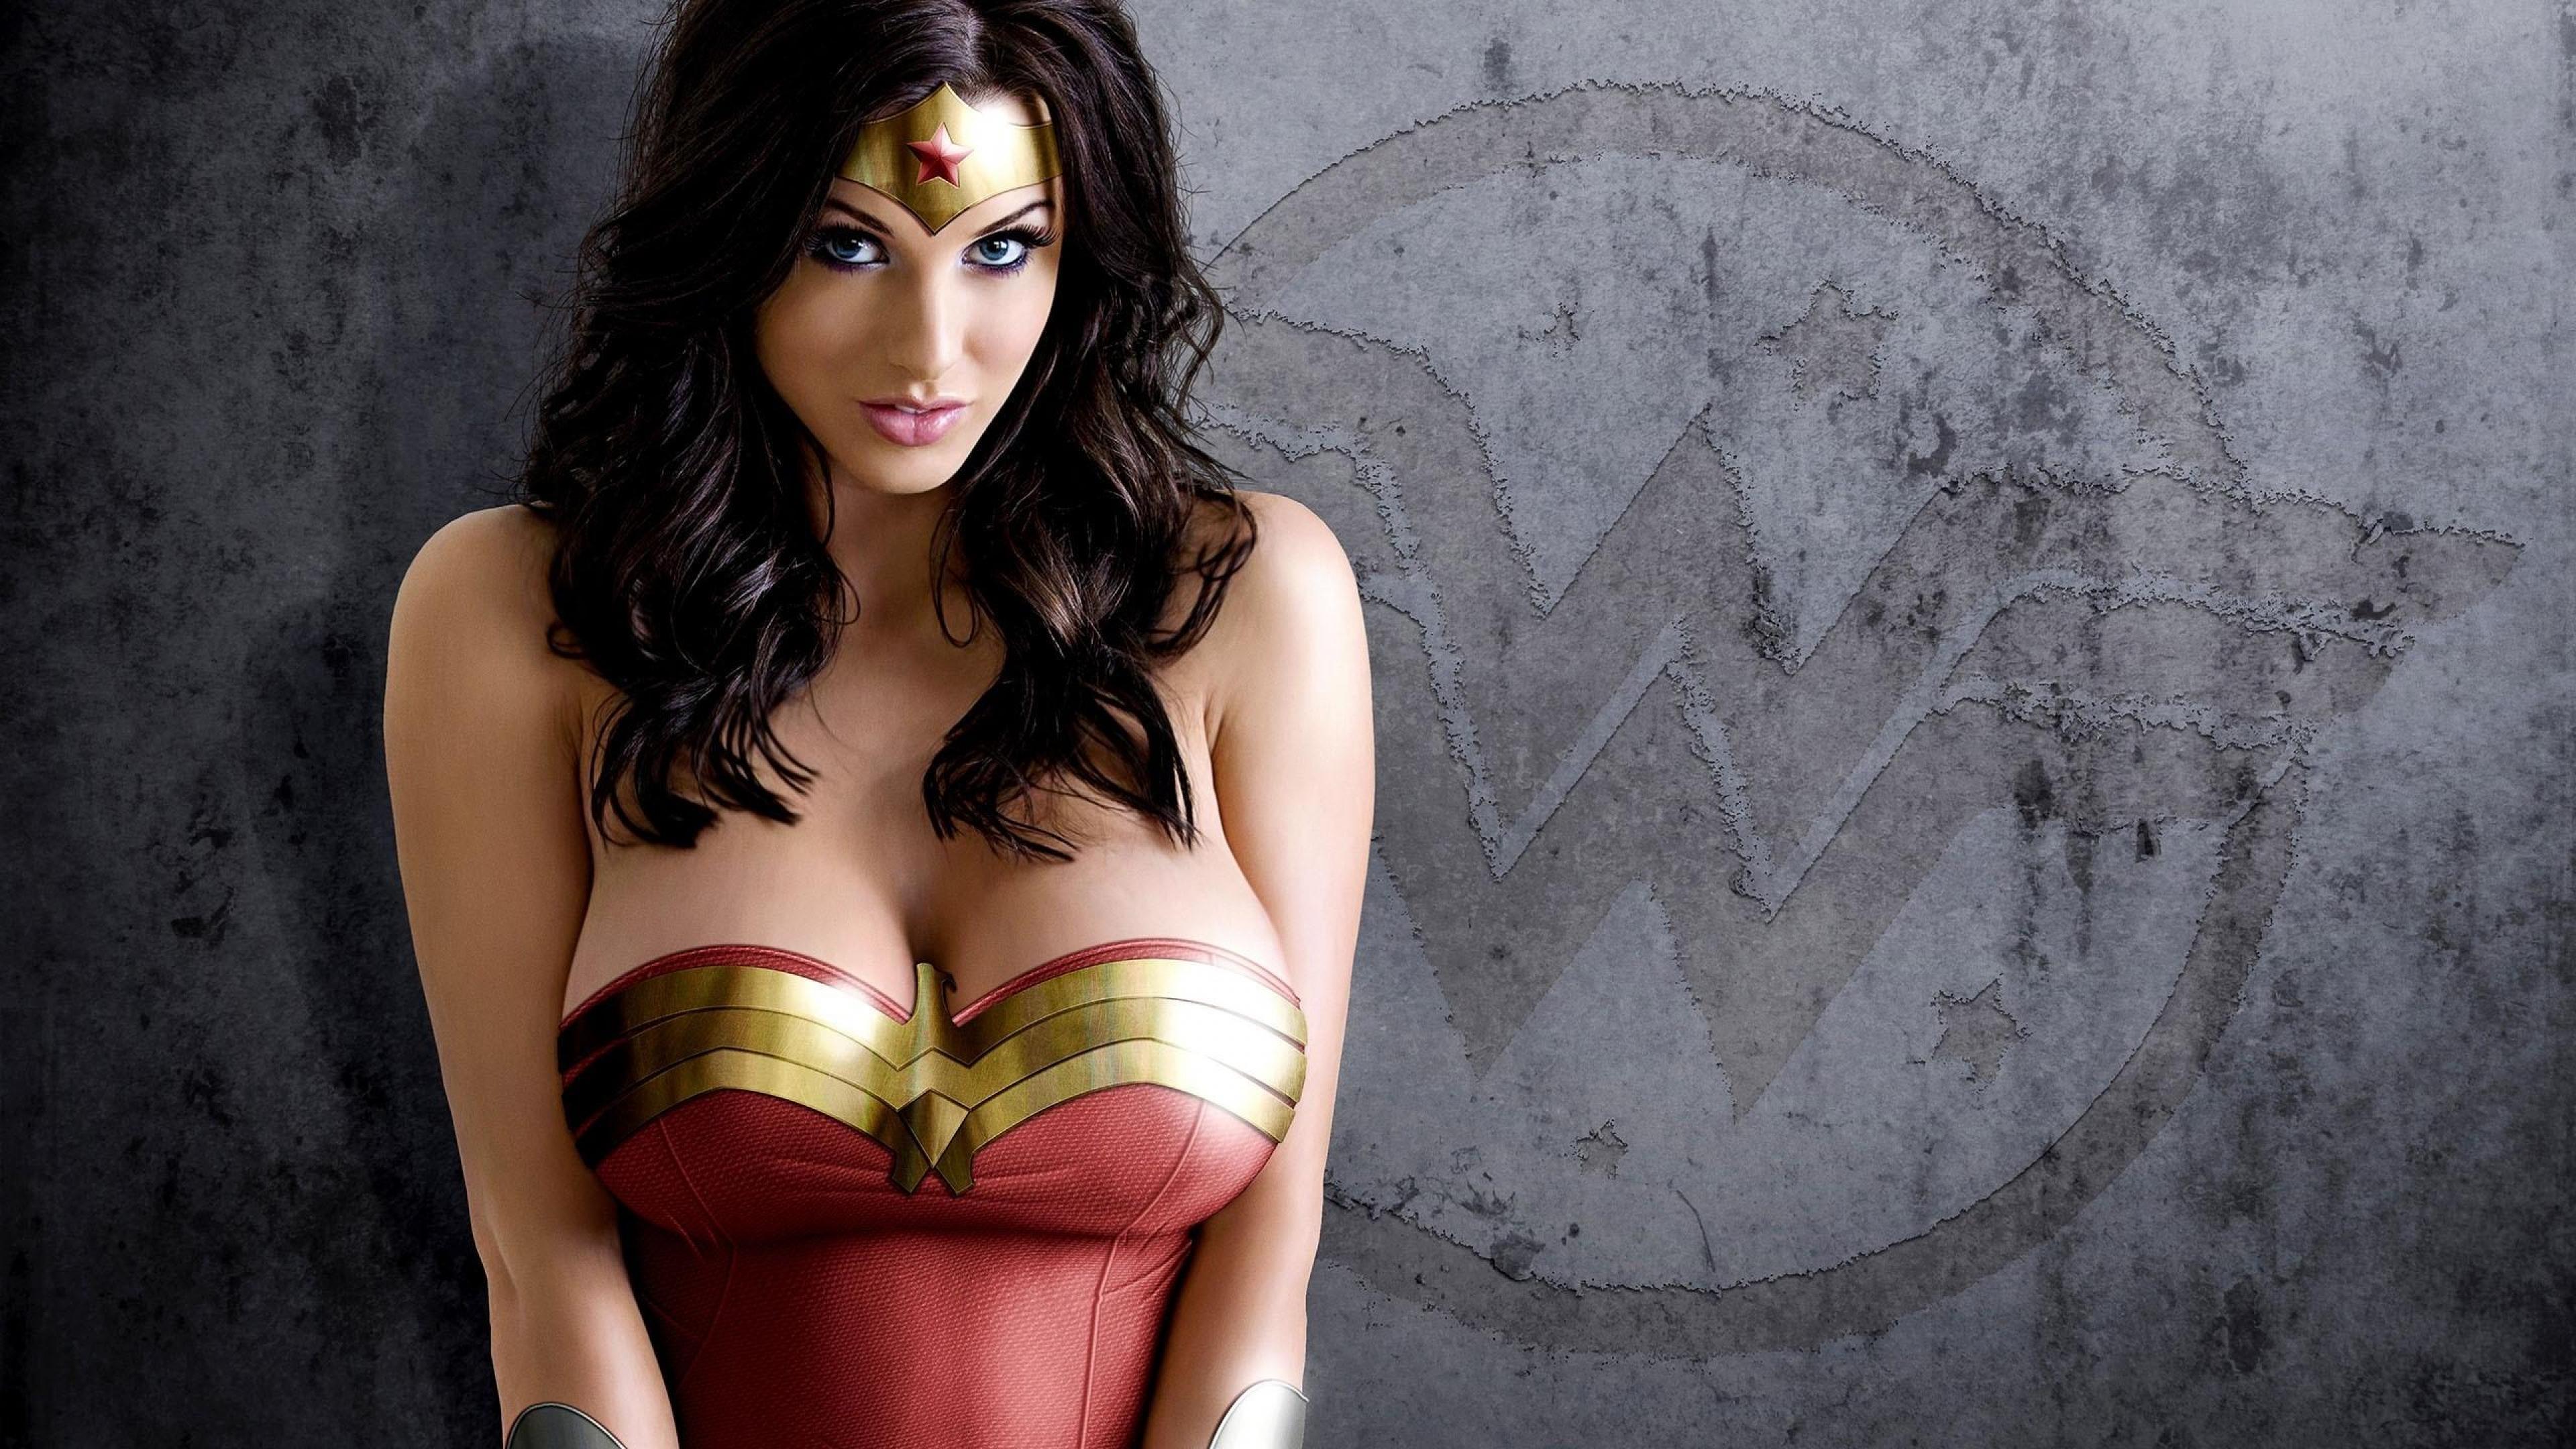 Woman Wonder woman Girls Wonder HD Wallpapers, Desktop Backgrounds